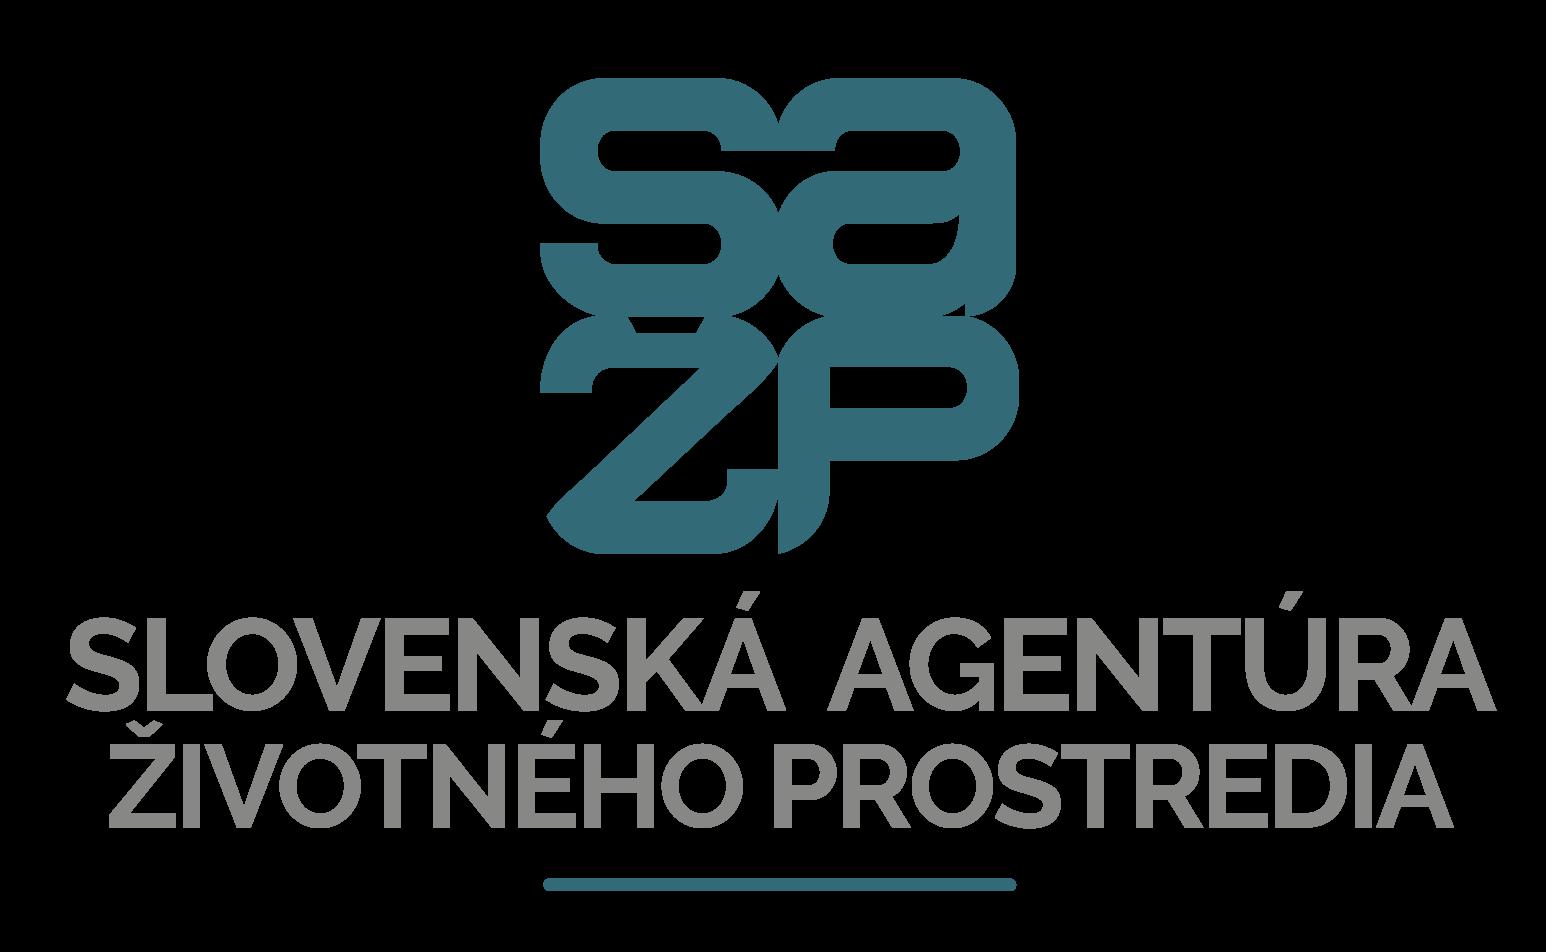 logotyp-SAZP-2015-A-00